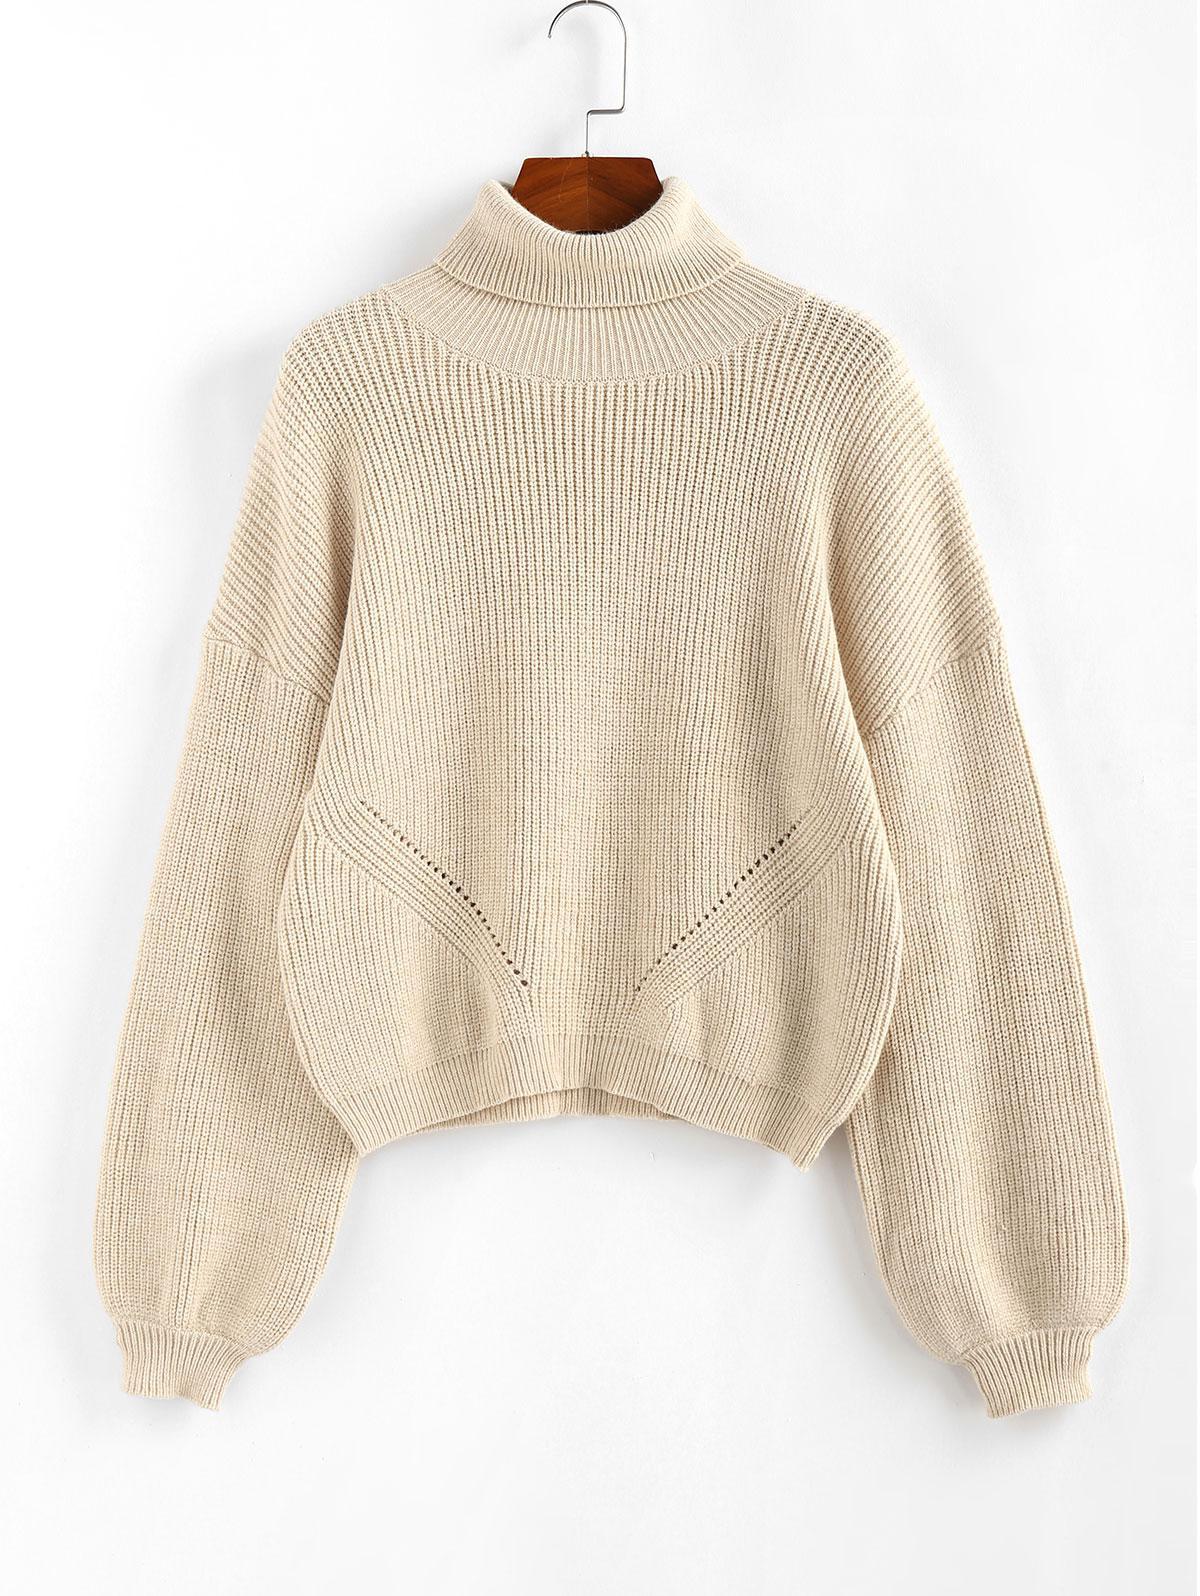 Zaful Turtleneck  Sweater